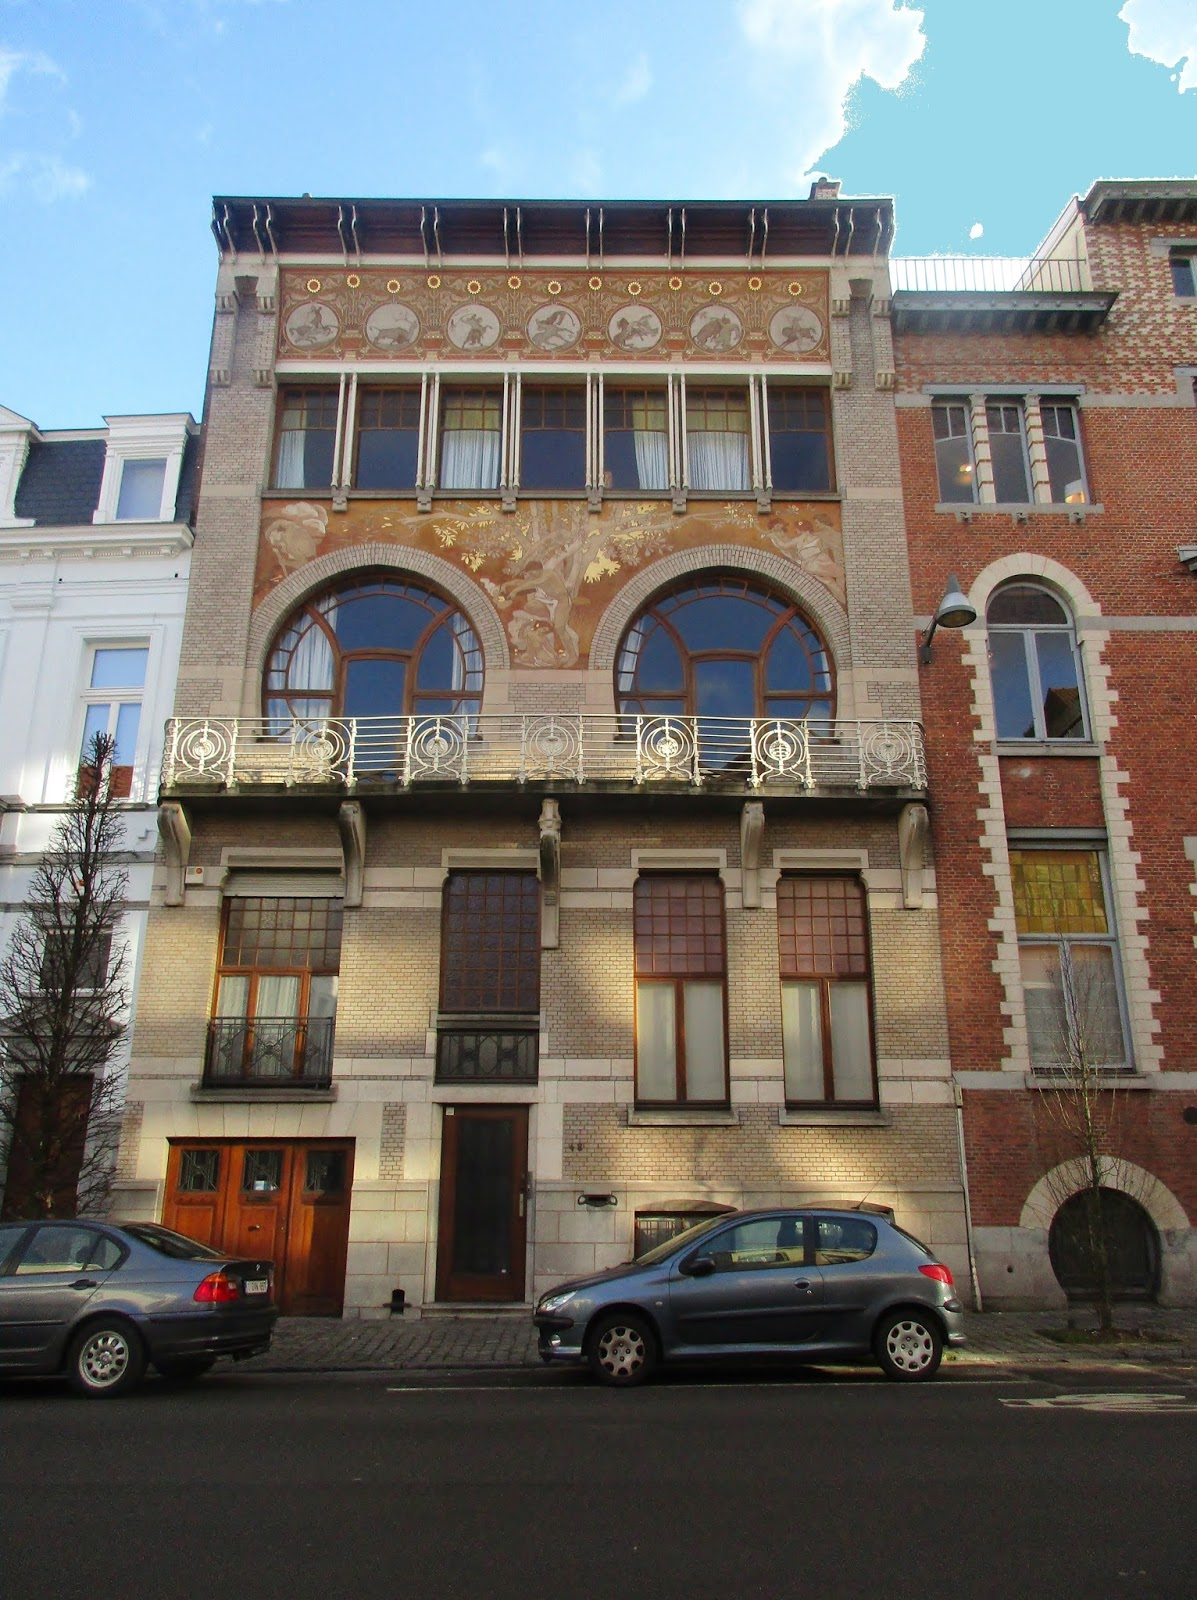 Paul hankar en huis ciamberlani knap staaltje art nouveau in elsene blogcatalog - Model van huisarchitectuur ...